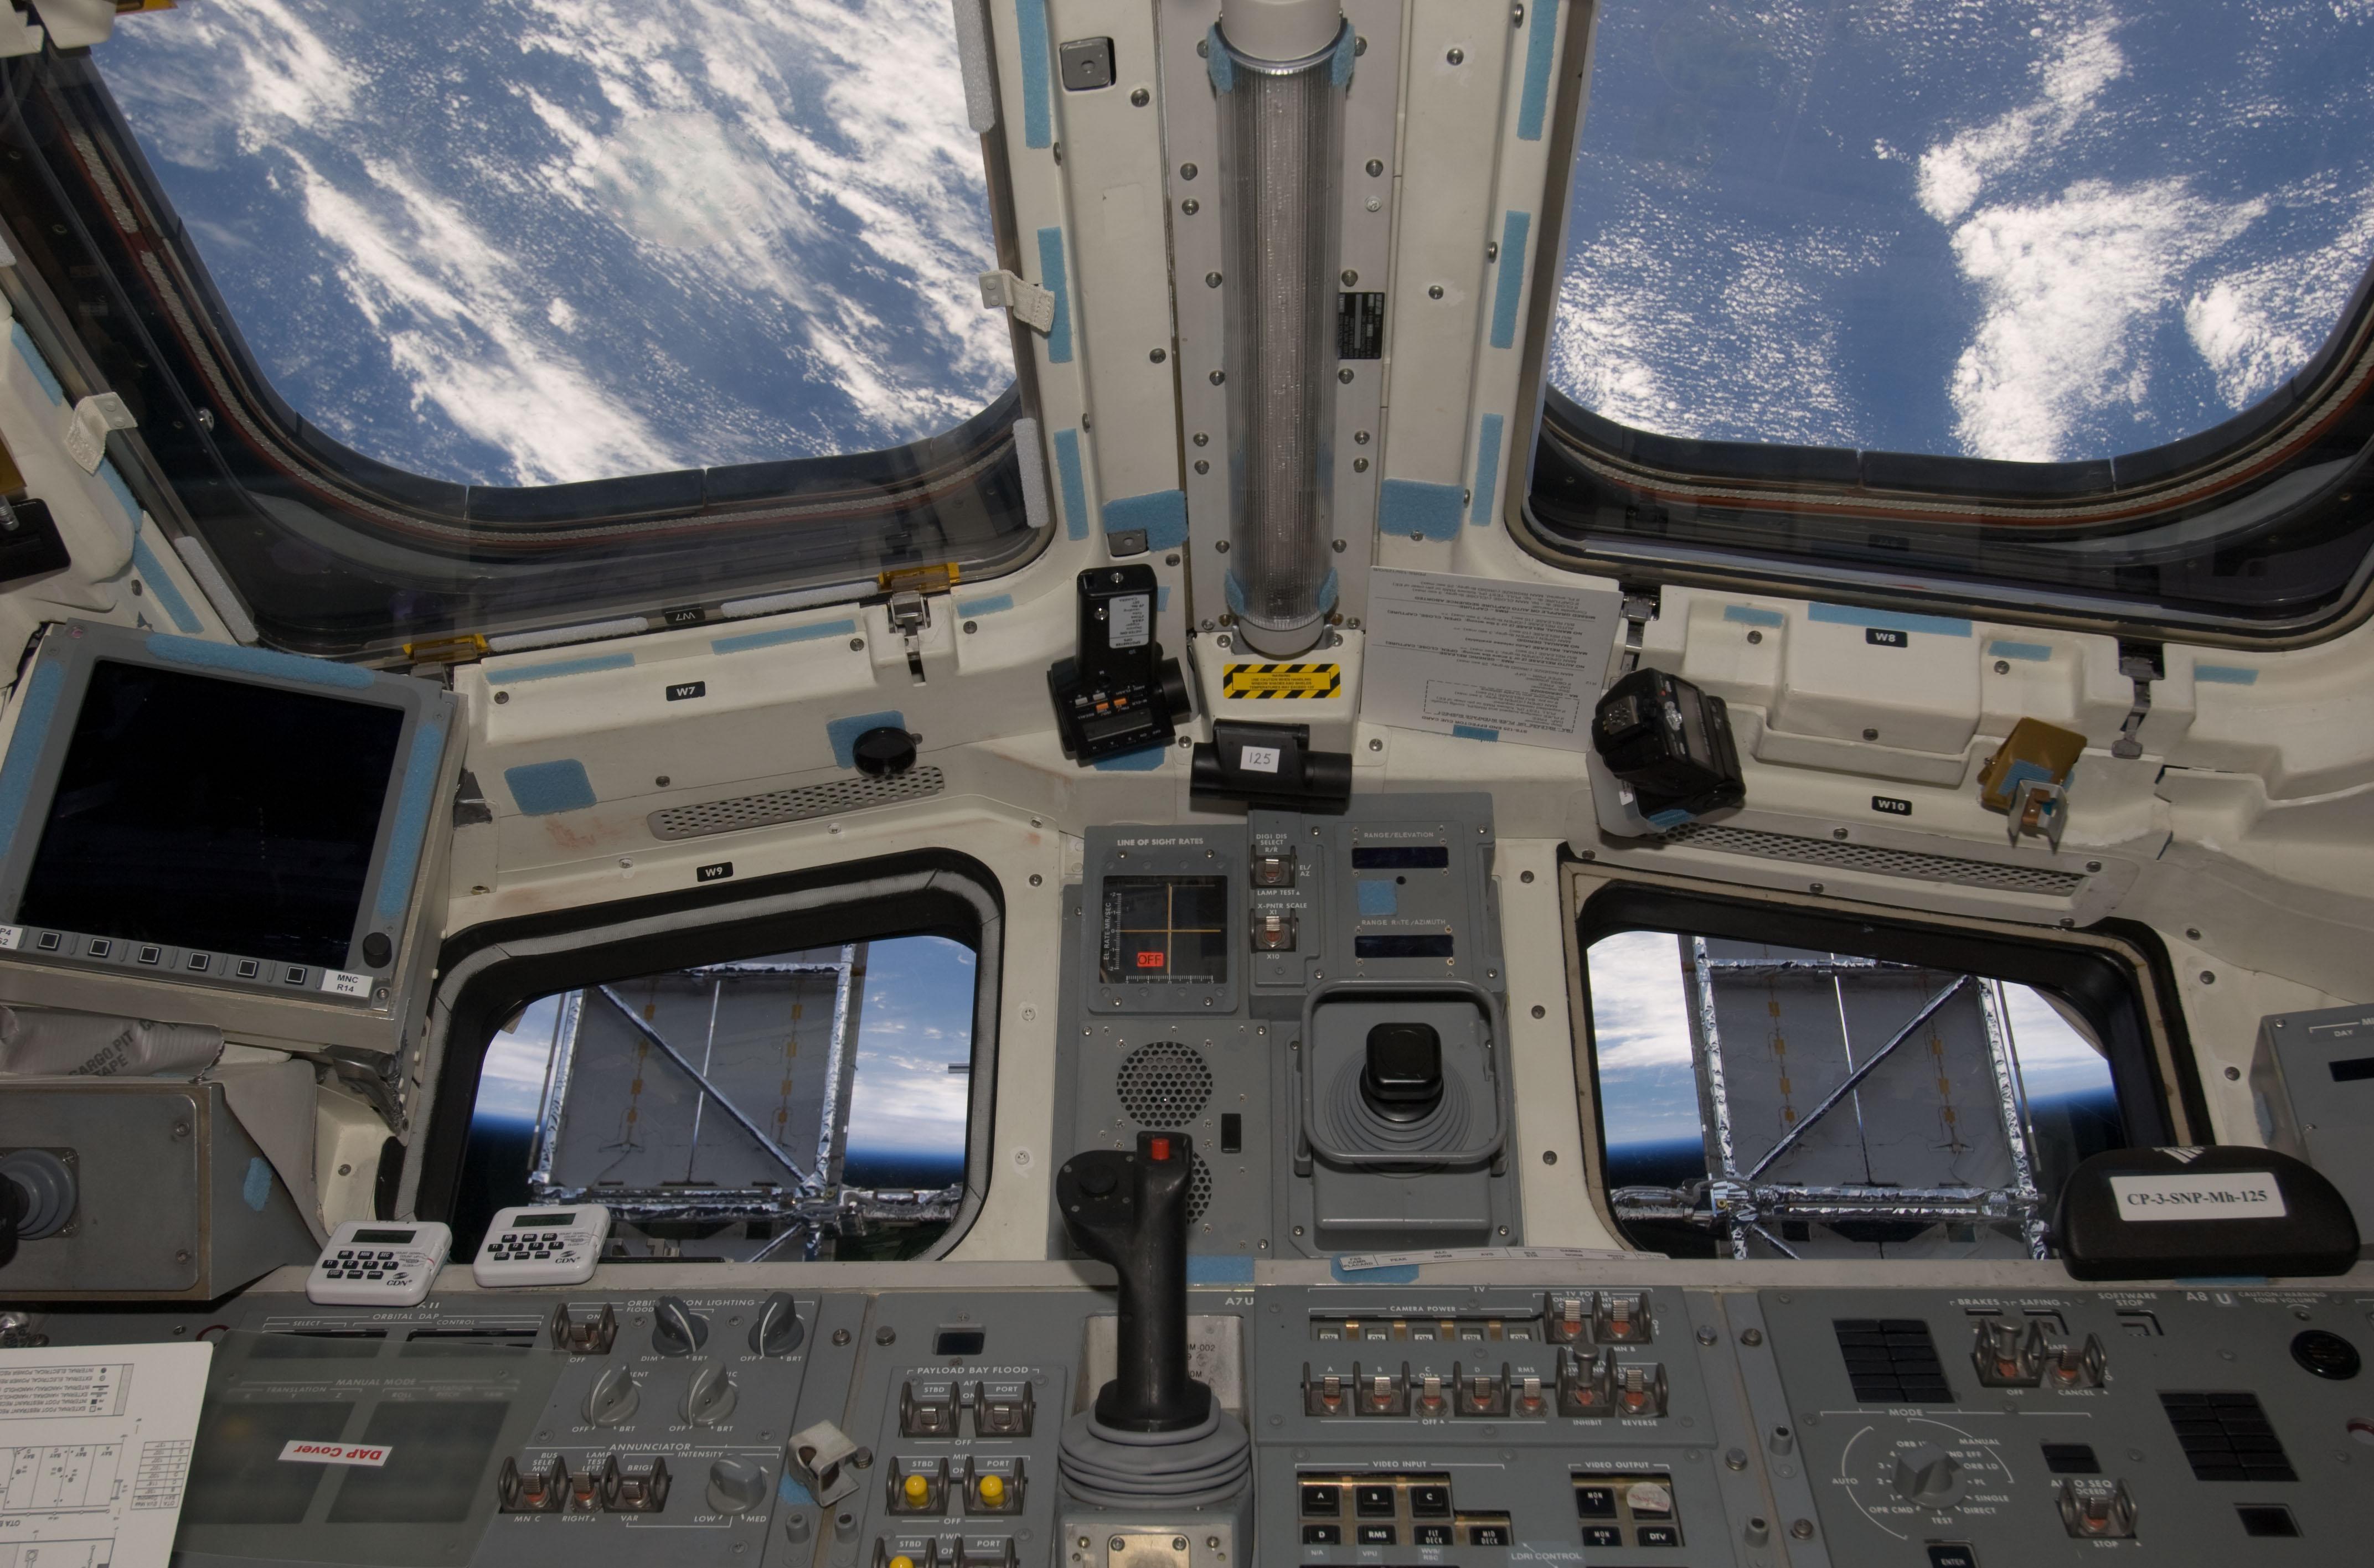 space shuttle window - photo #7